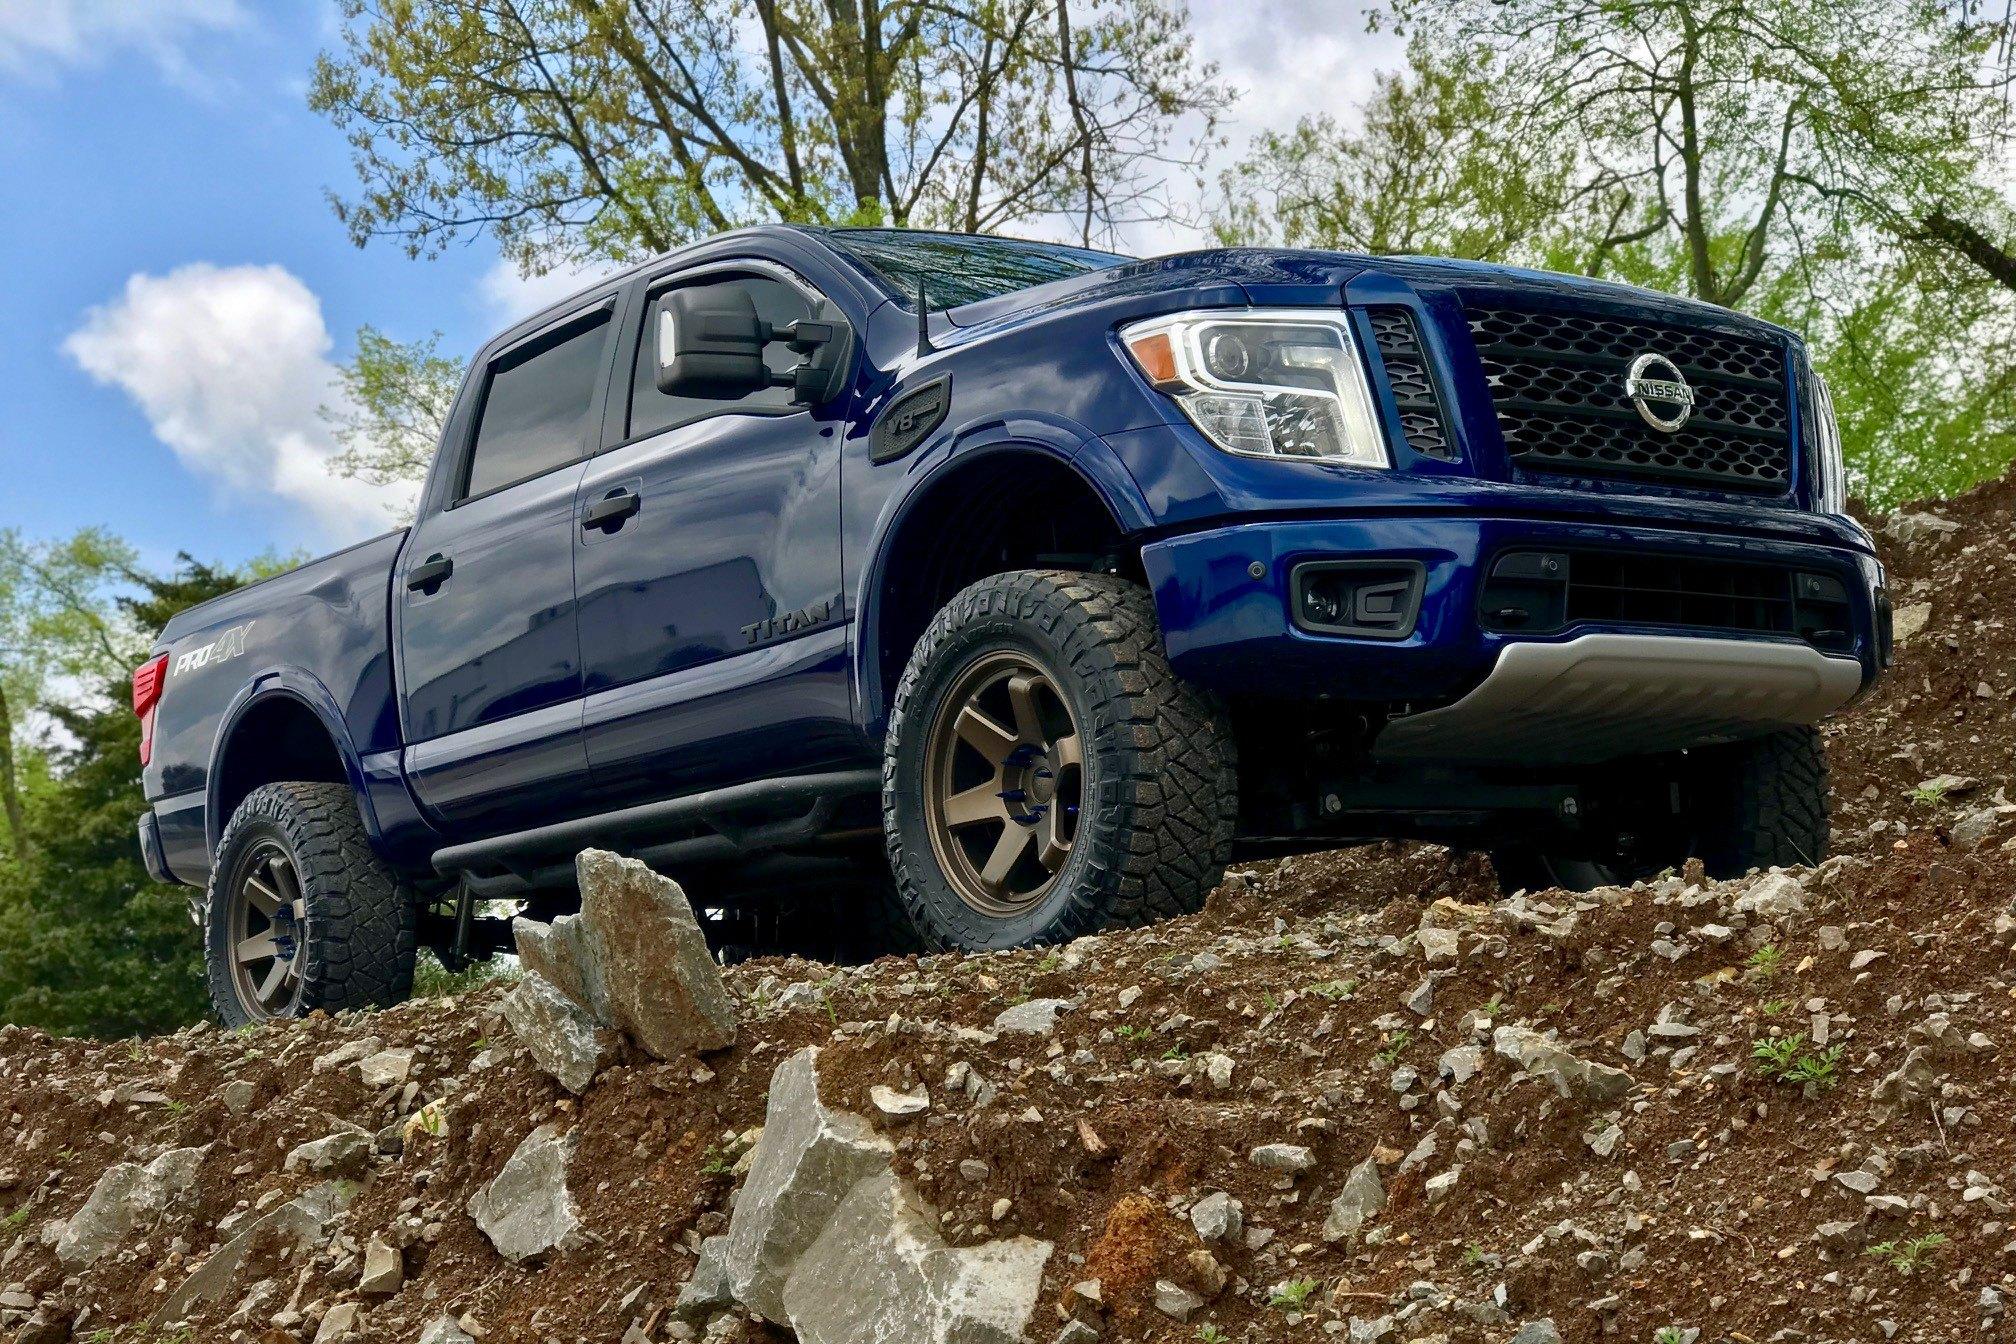 Custom 2018 nissan titan images mods photos upgrades - Nissan titan interior accessories ...